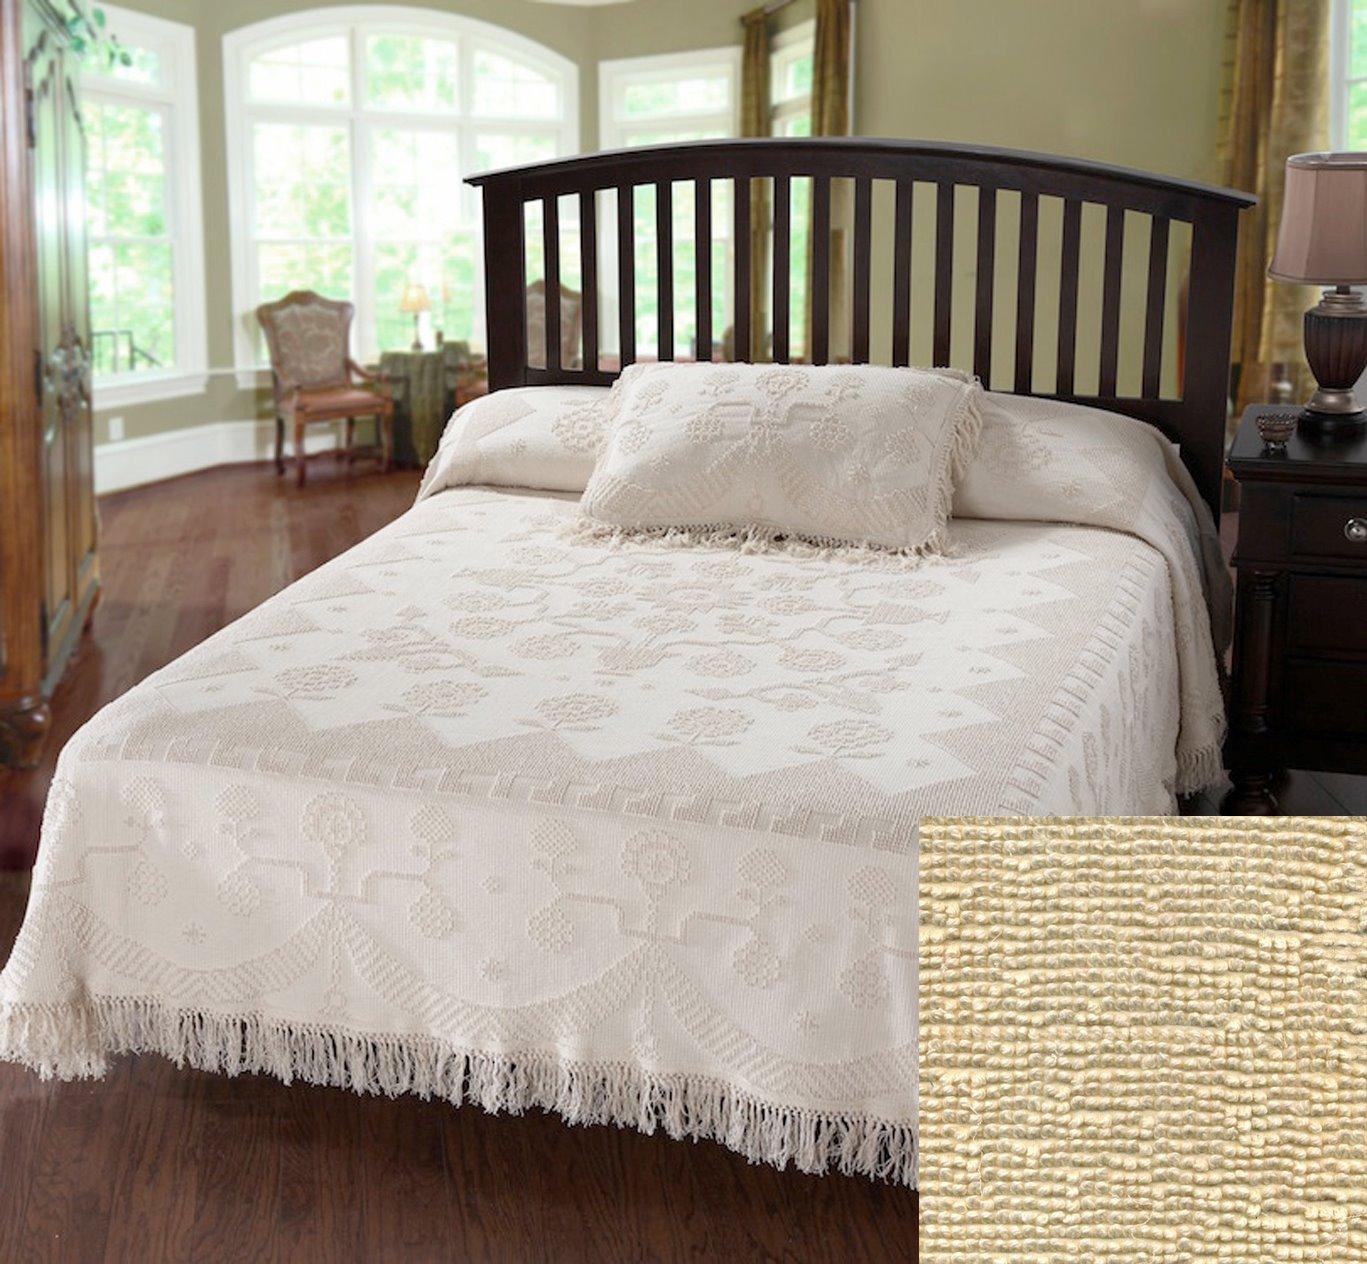 George Washington Bedspread King Antique